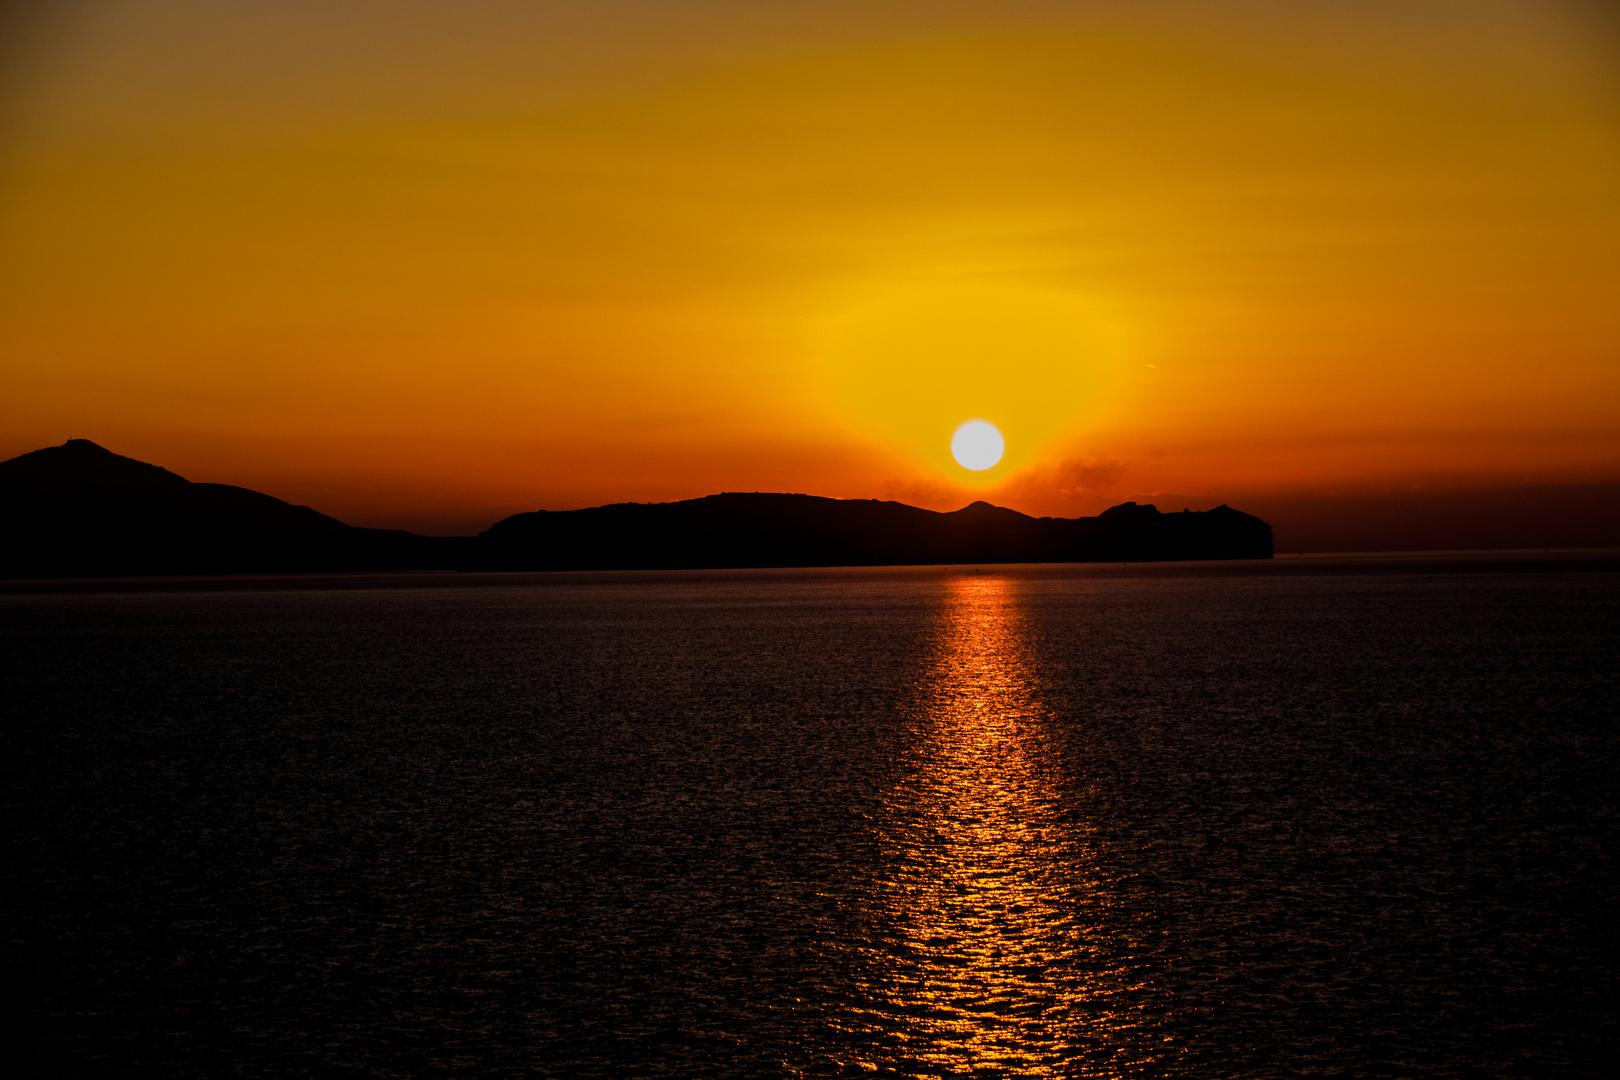 Sonnenaufgang in der Kaldera